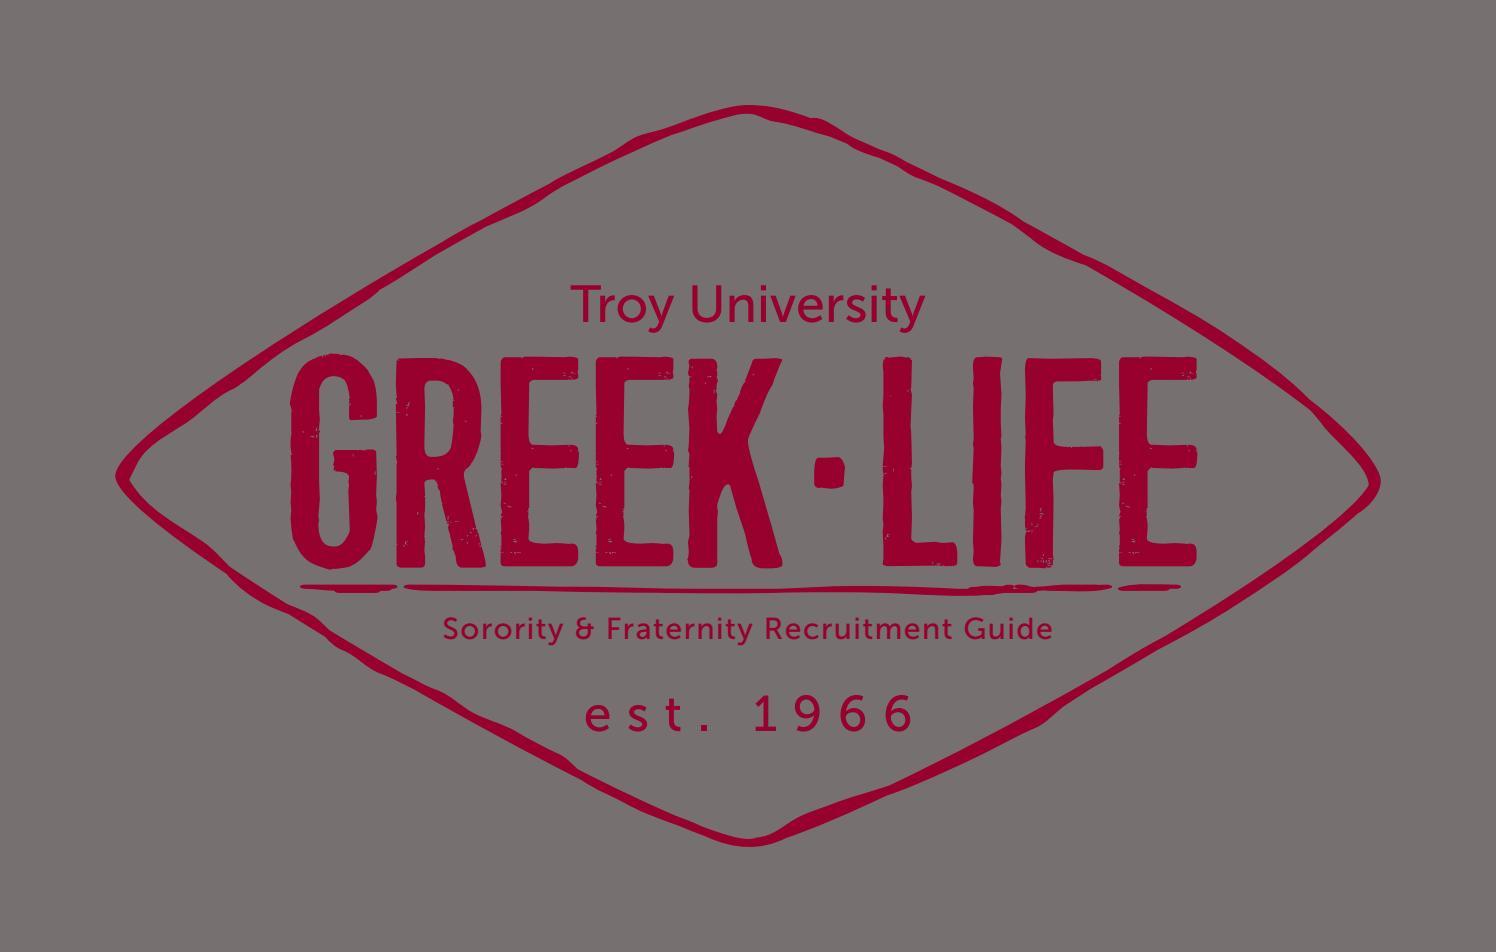 troy university greek life